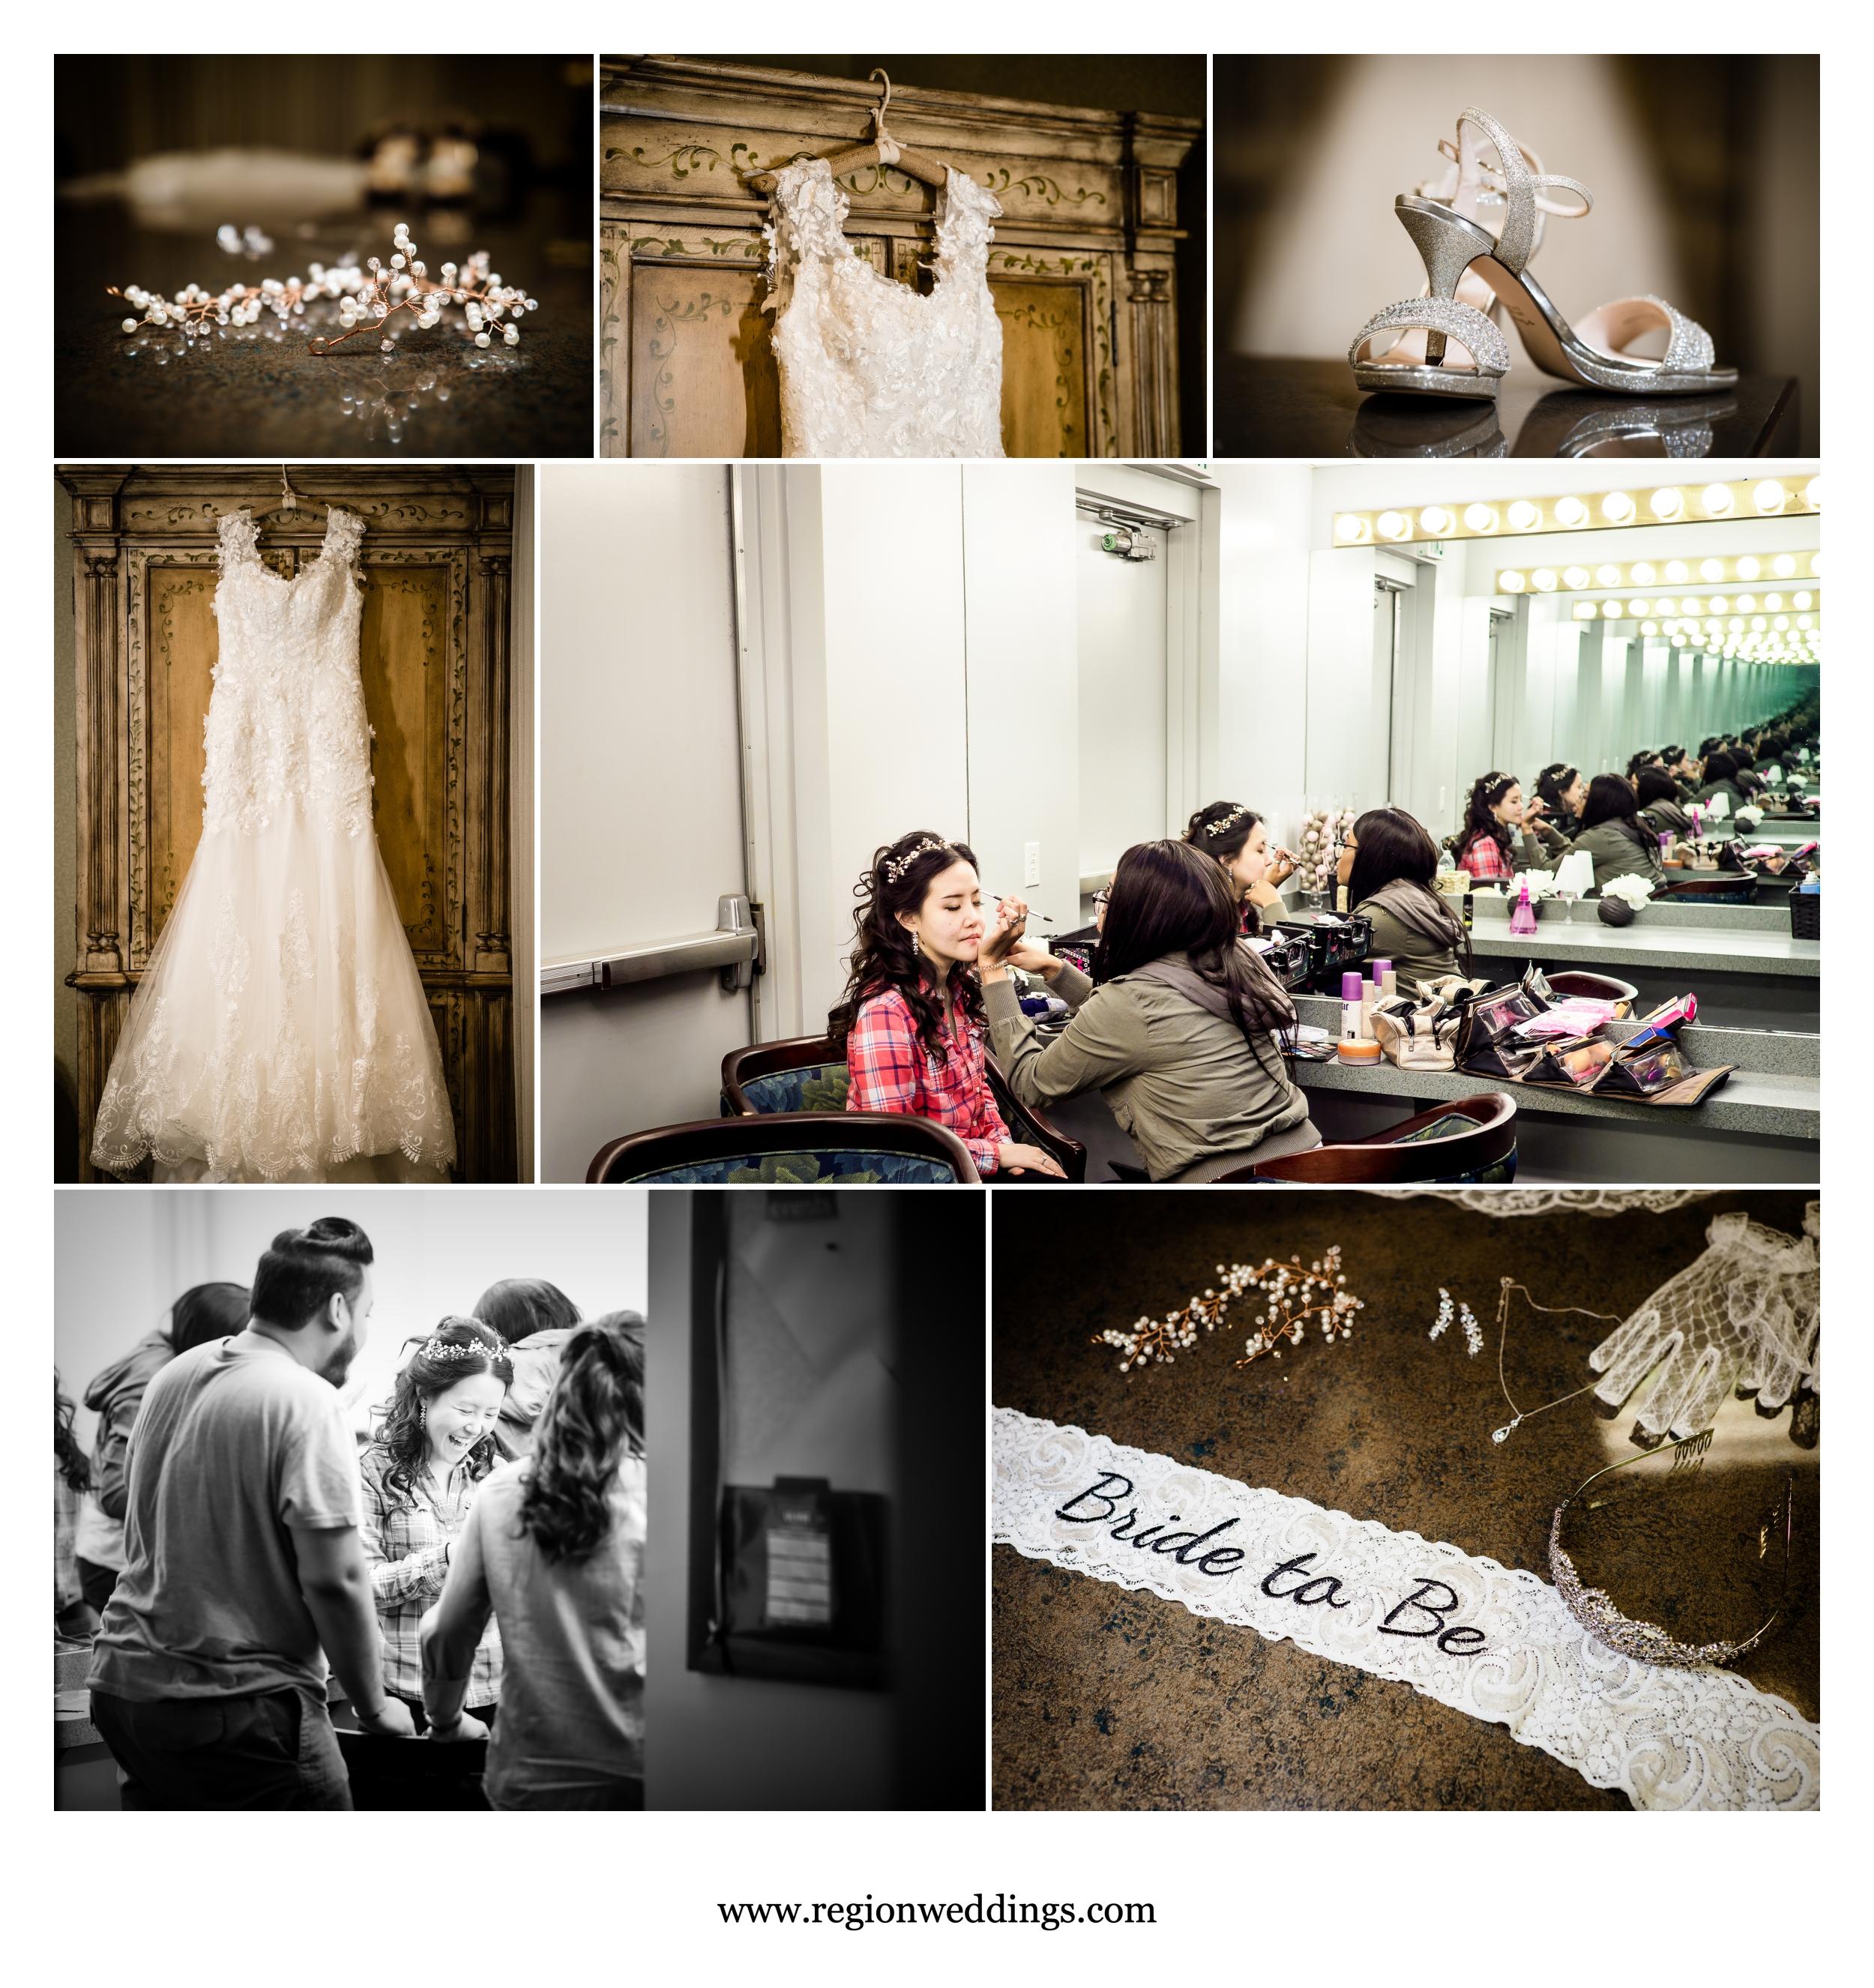 Bridal prep for a summer wedding at Briar Ridge.